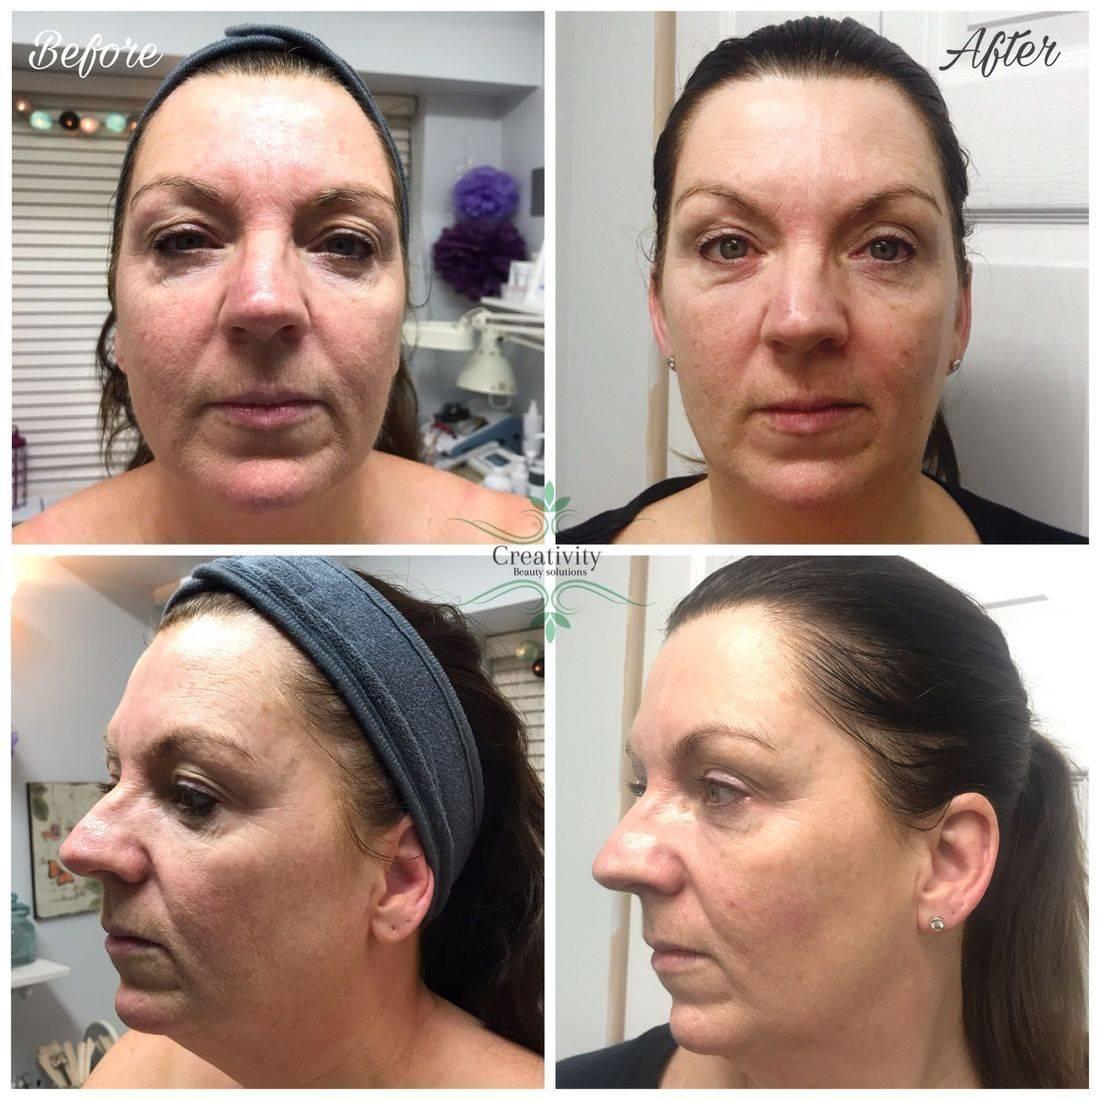 Non-Surgical Face Lift, Dermalogica, facial toning, beauty salon, Creativity Beauty Solutions